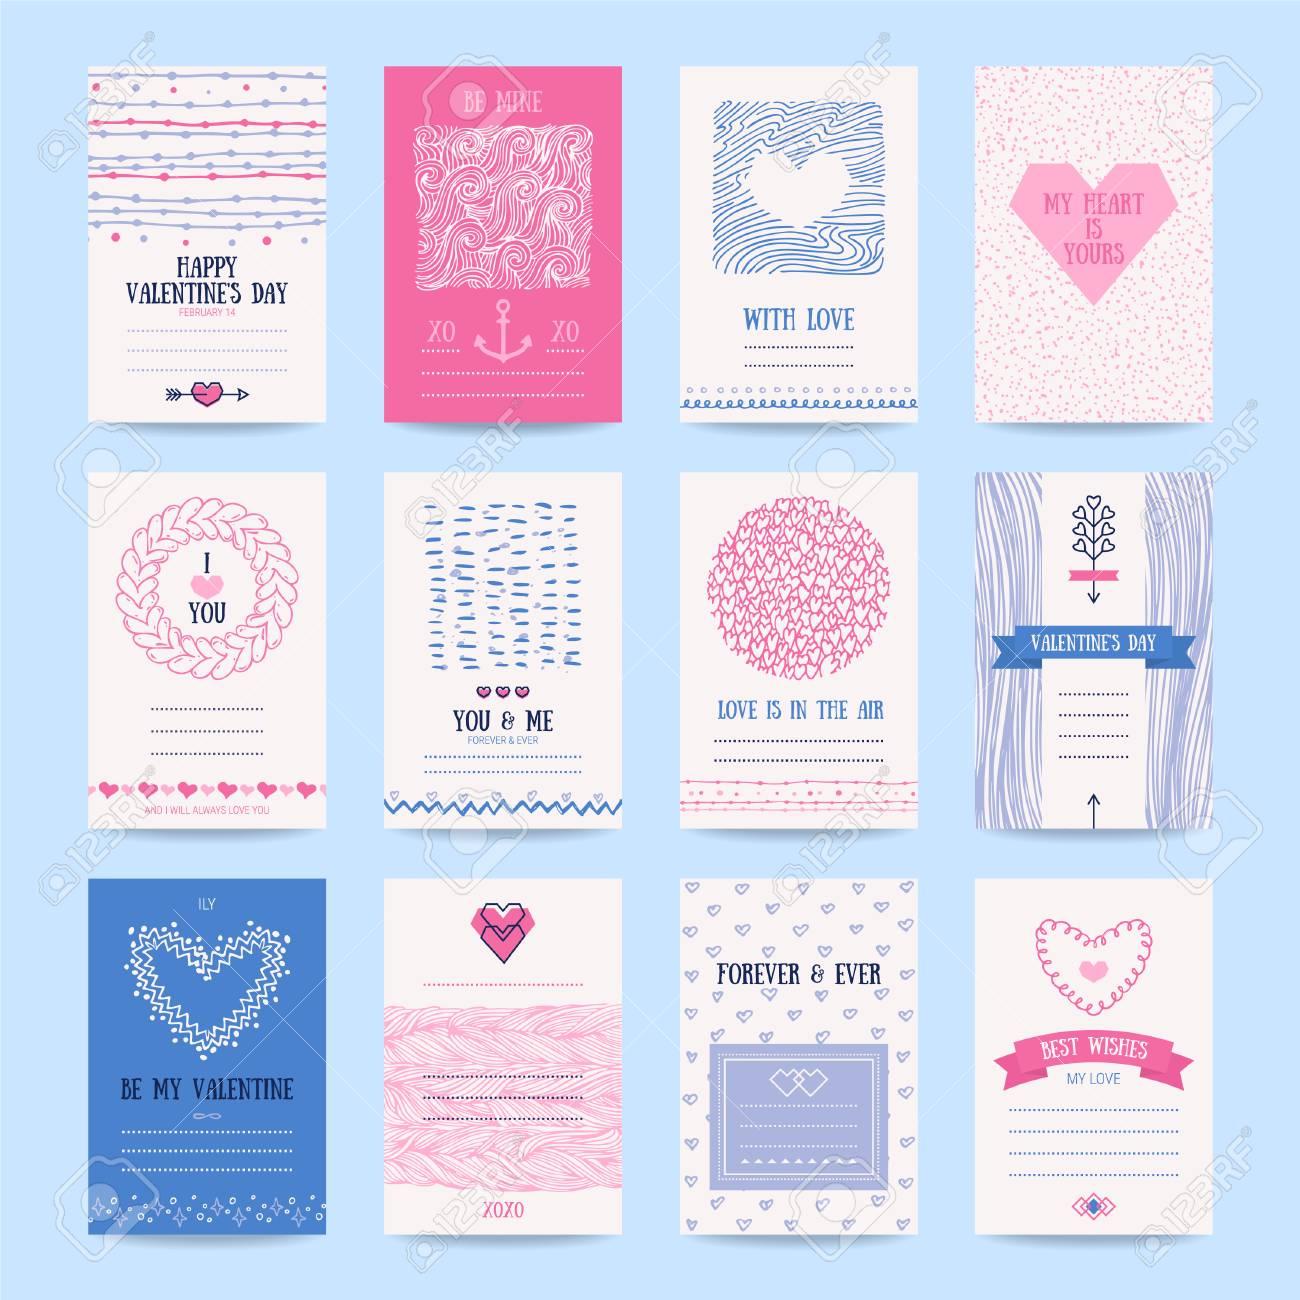 Valentines Day Wedding Invitation Romantic Love Cards Hipster